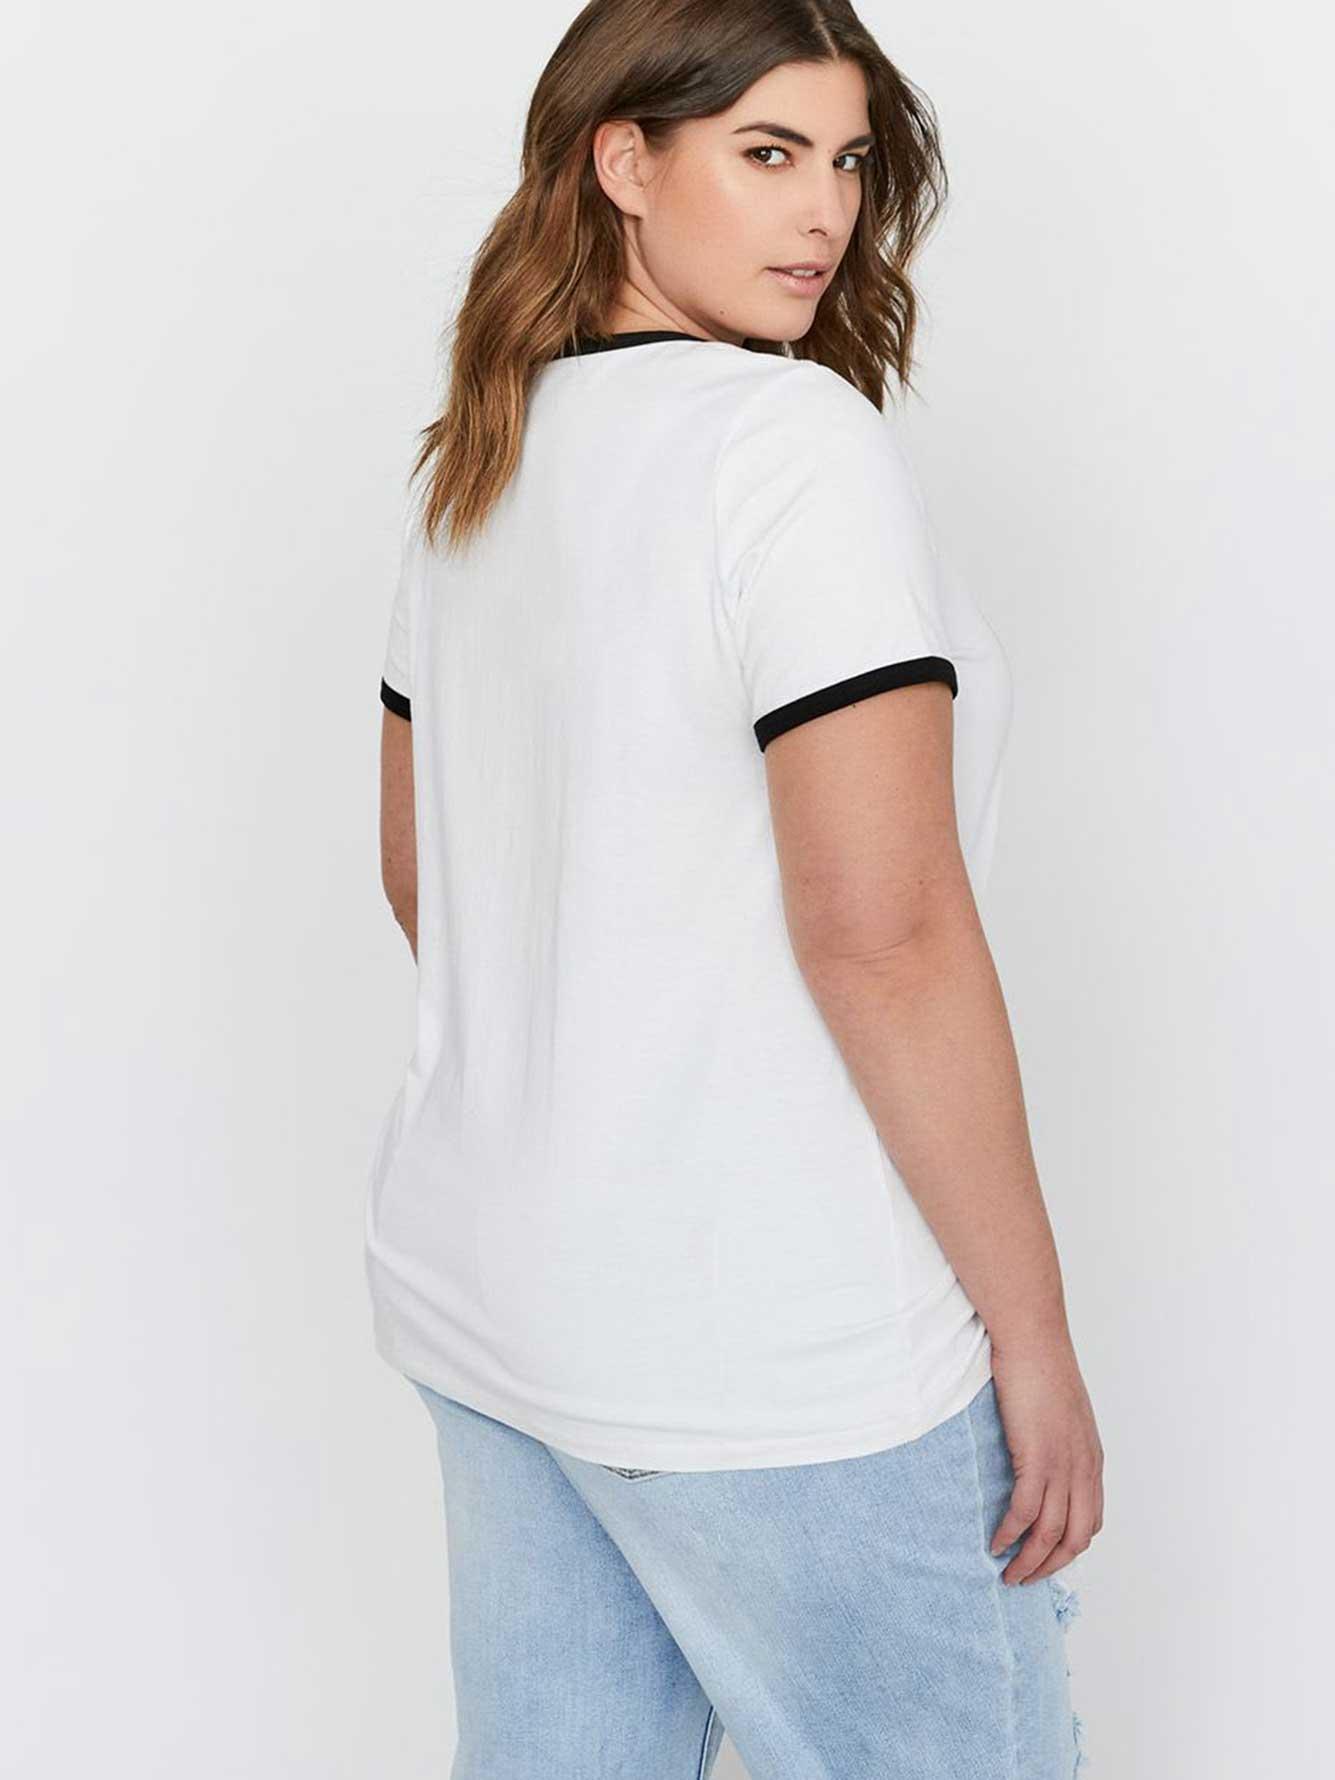 a4a19ef83a948 L L x Jordyn Woods Graphic Print T-Shirt